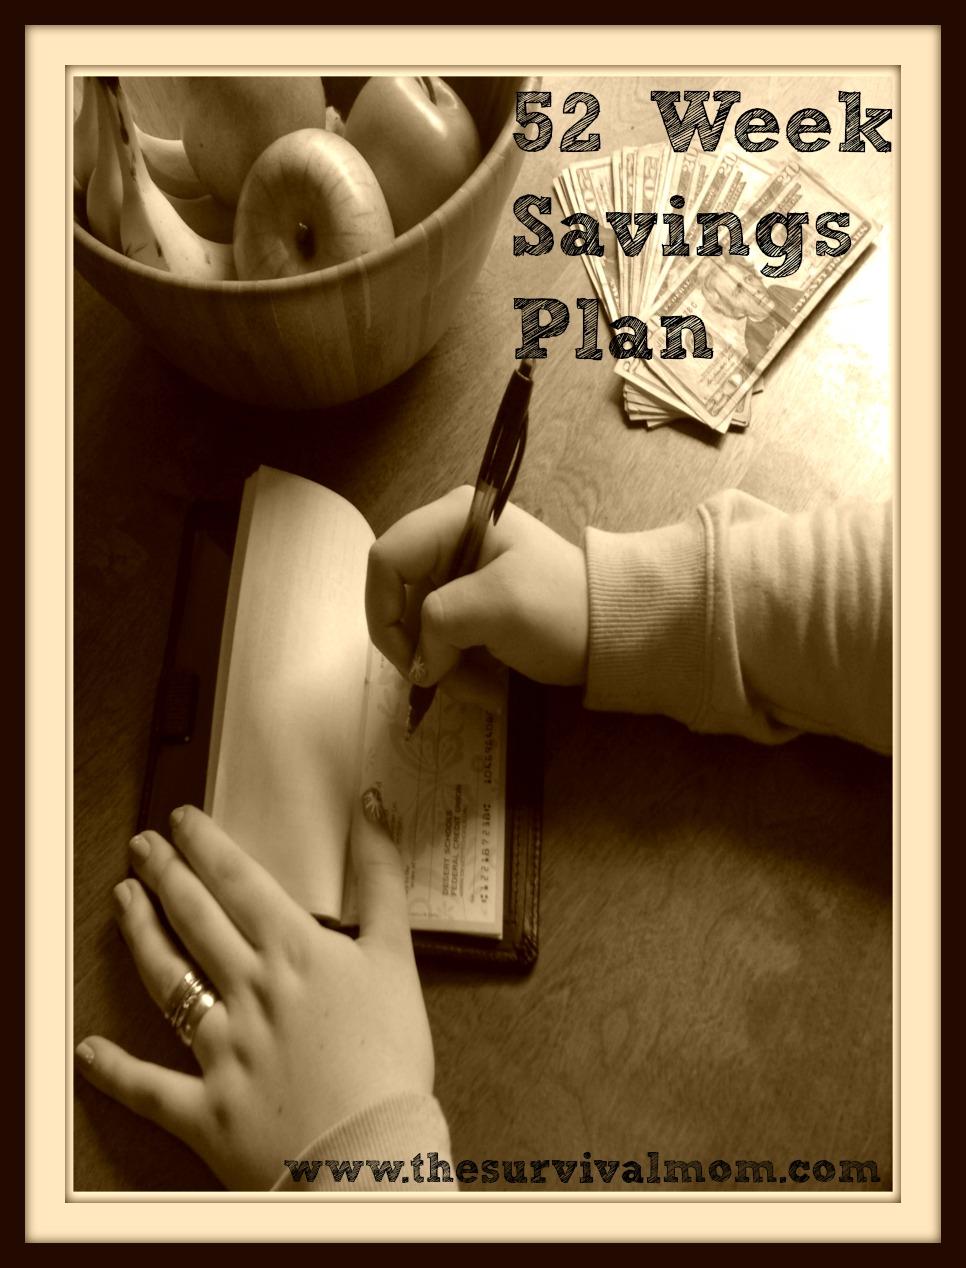 52 Week Savings Plan: March prepping bargains to keep your savings on track